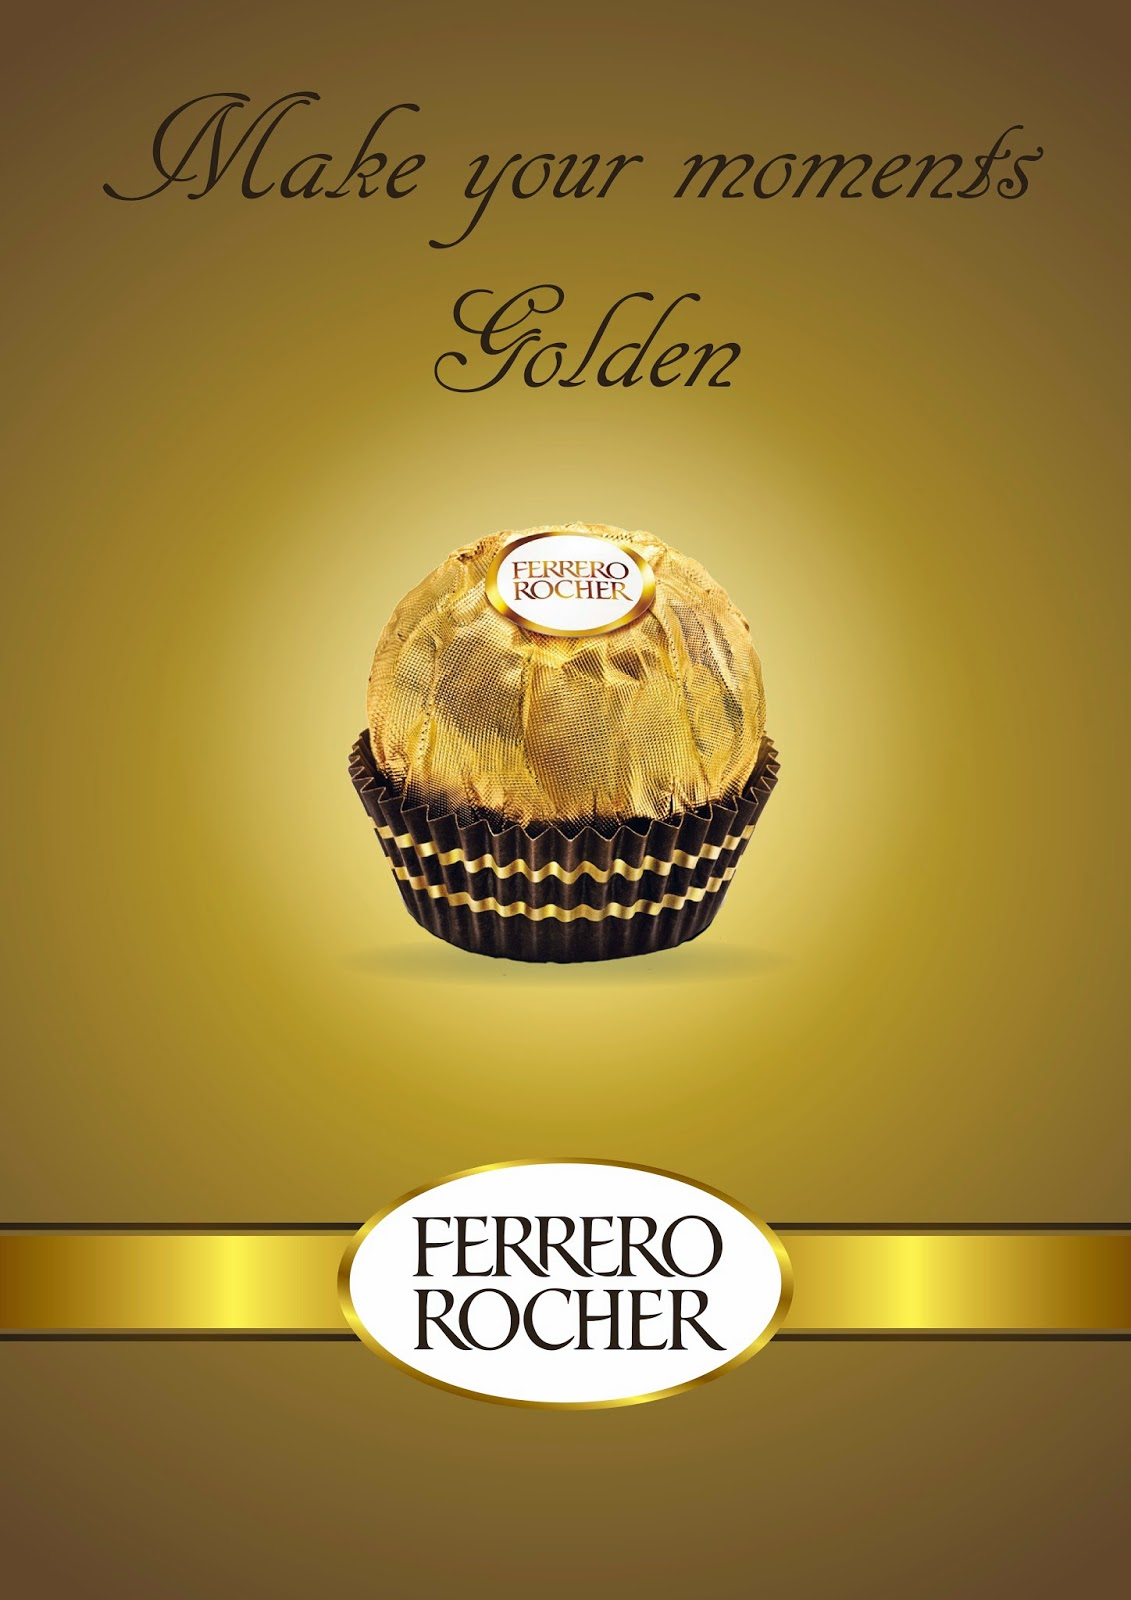 My Works: #18 Ferrero Rocher Poster